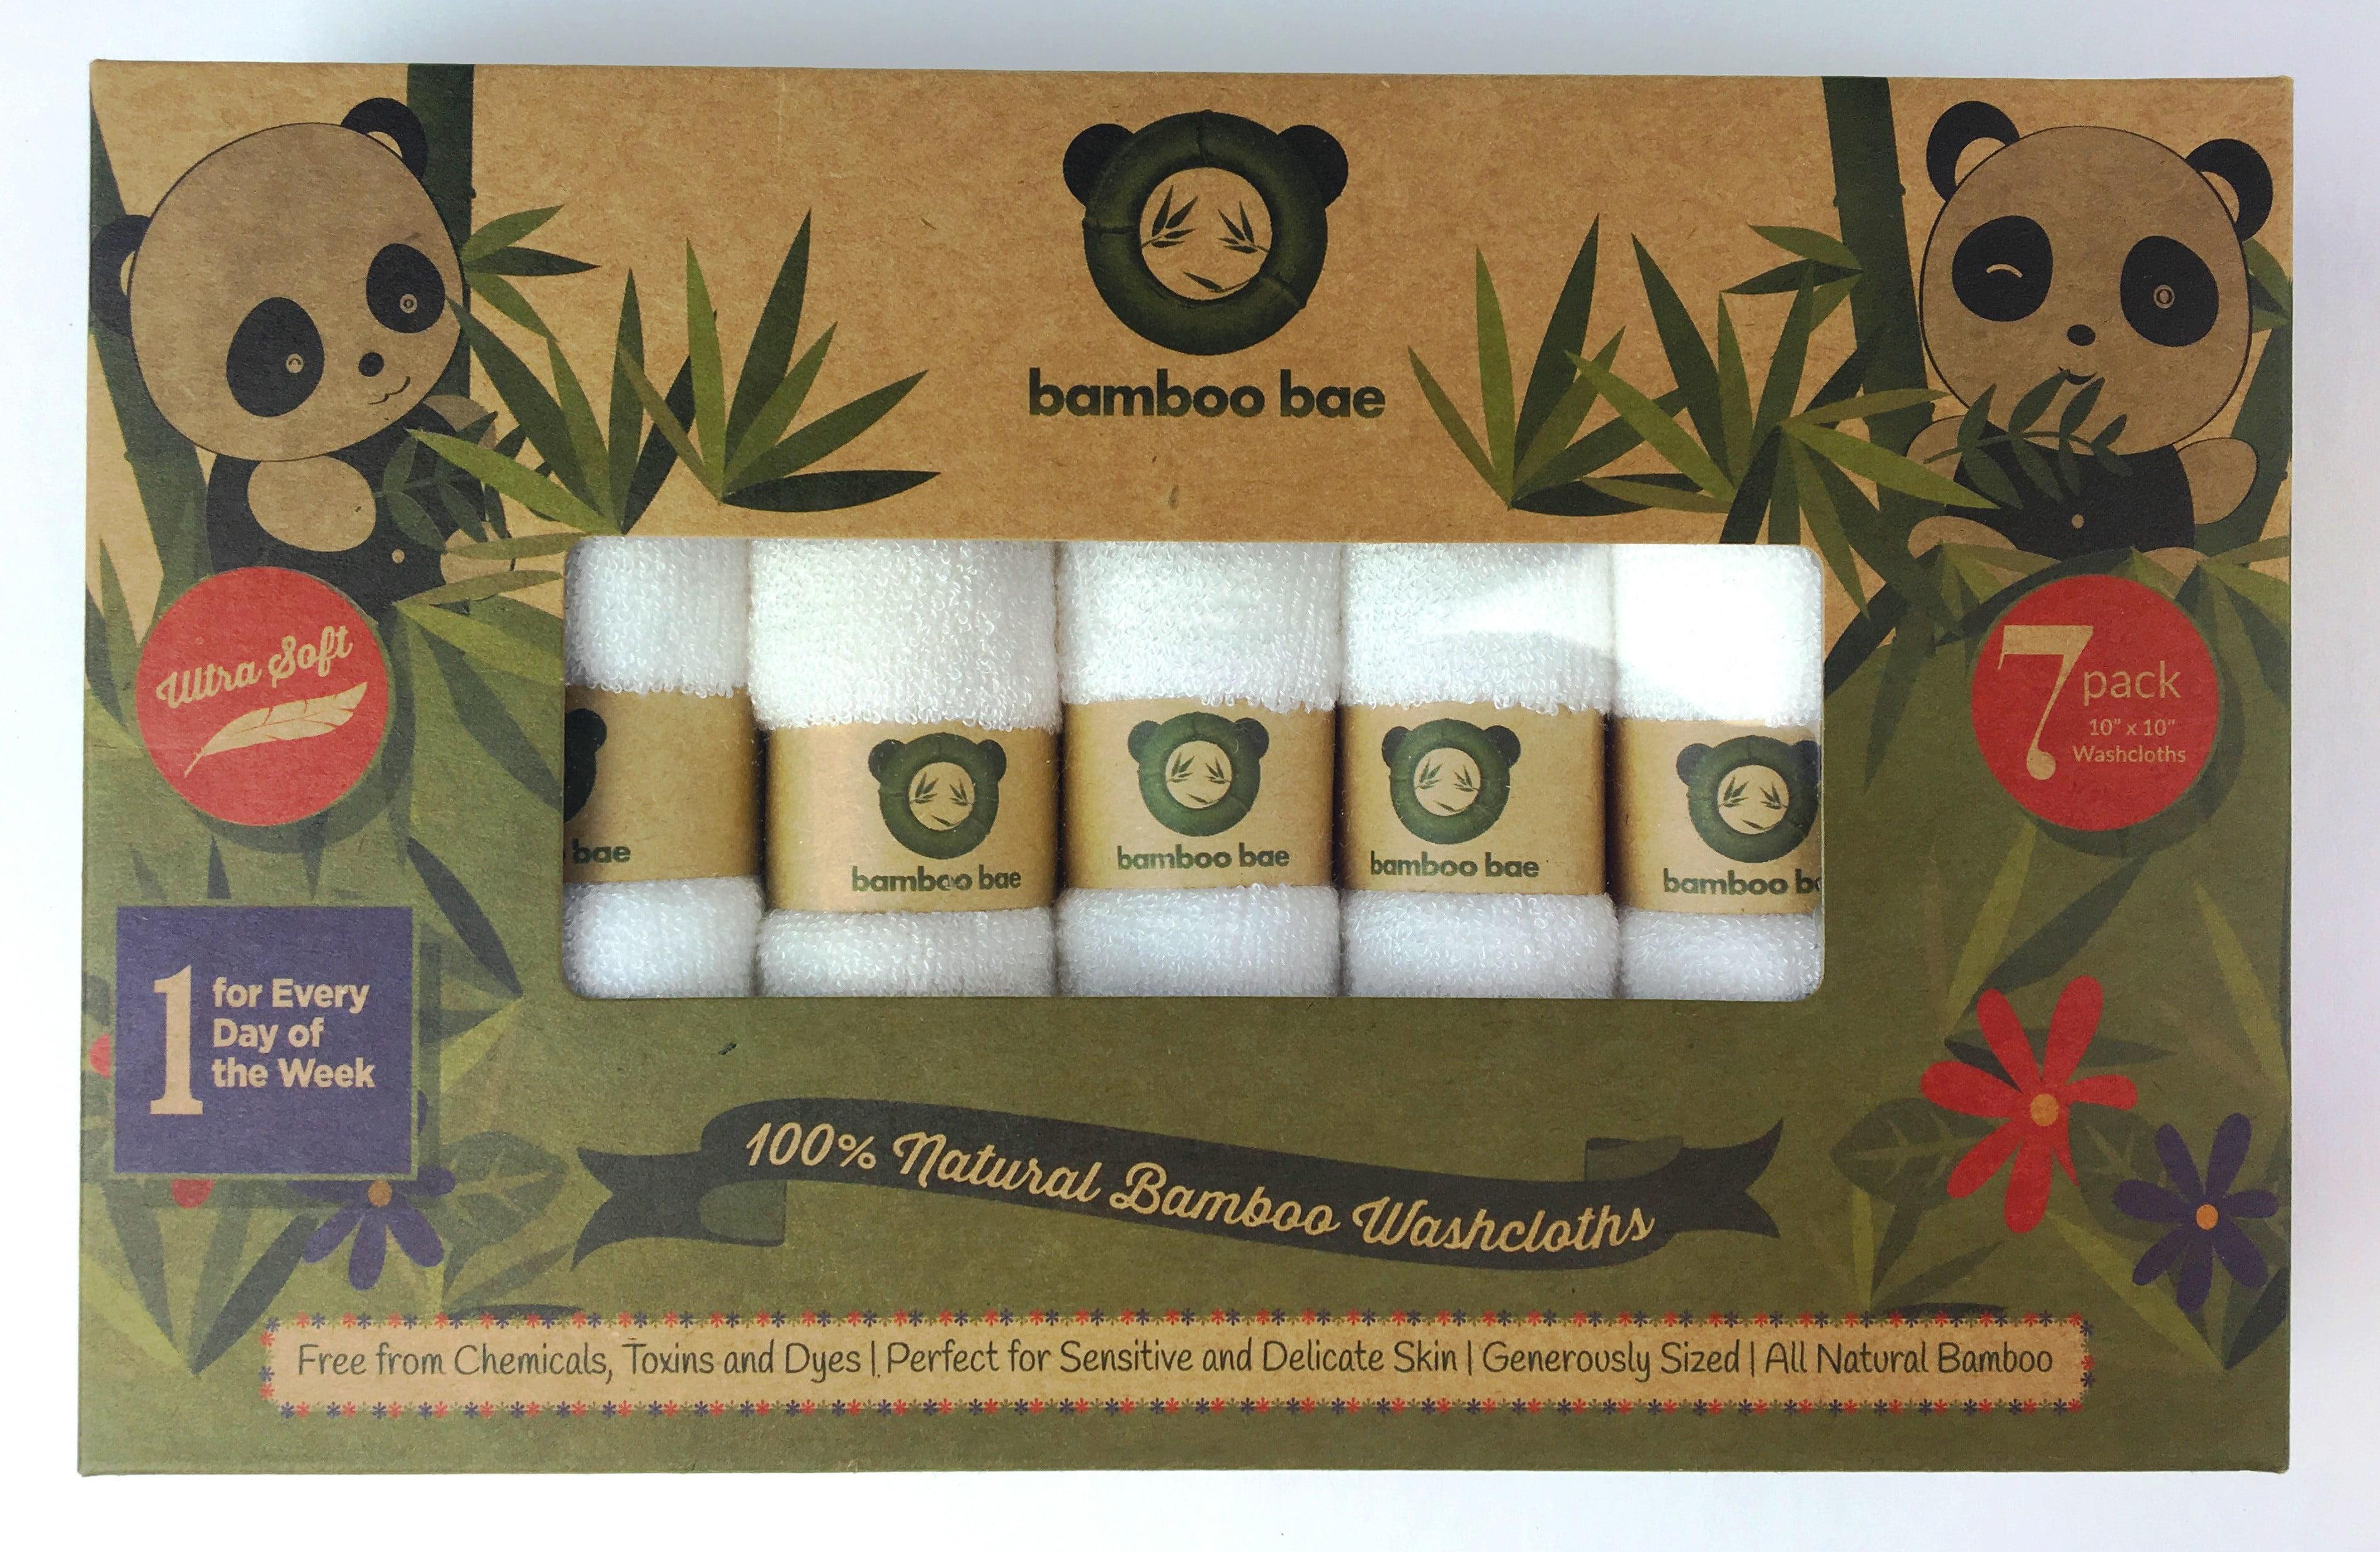 Bamboo Bae 7 SUPER SOFT Baby Bath Washcloths, 100% Natural Bamboo Towels, No-Dyes, Perfect for Sensitive Baby... by Bamboo Bae